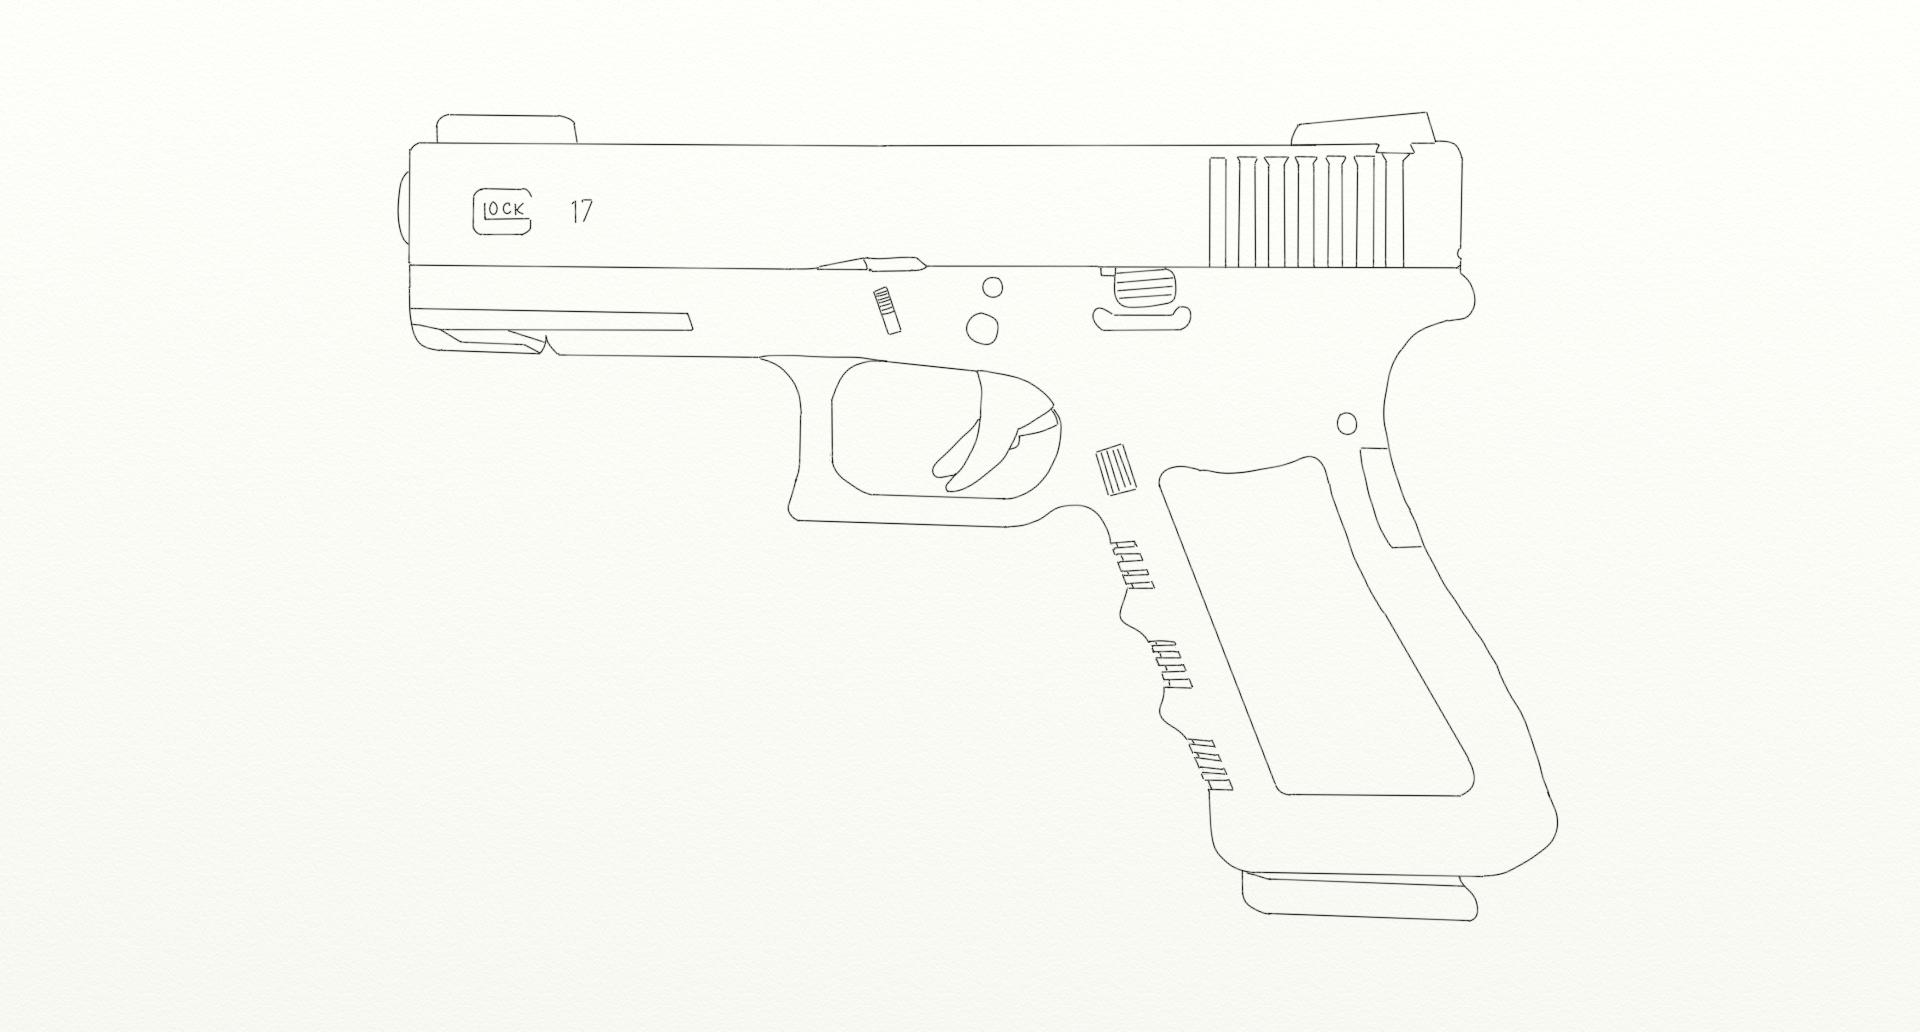 Glock 17 (line drawing) by cidician on DeviantArt